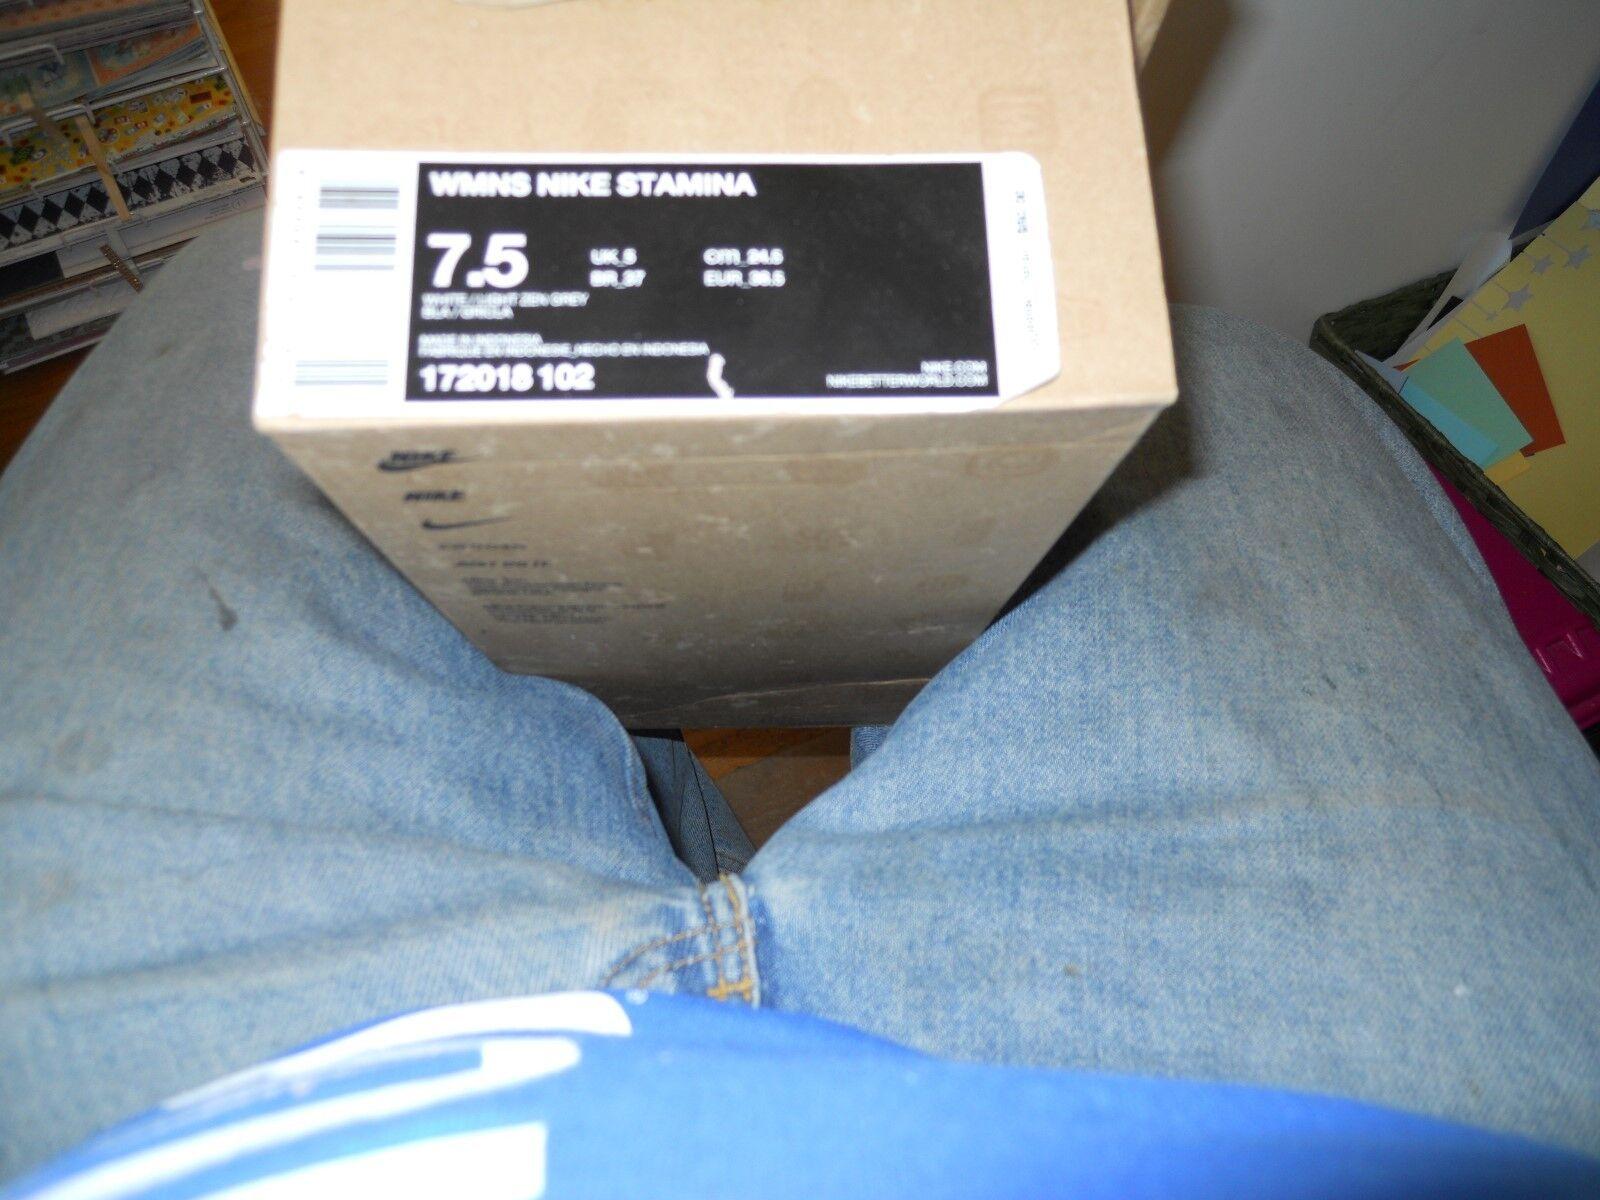 NIKE WMNS NIKE STAMINA WOMENS 7 1 2 Womens  GirlsCherrleading  shoes, New IN BOX